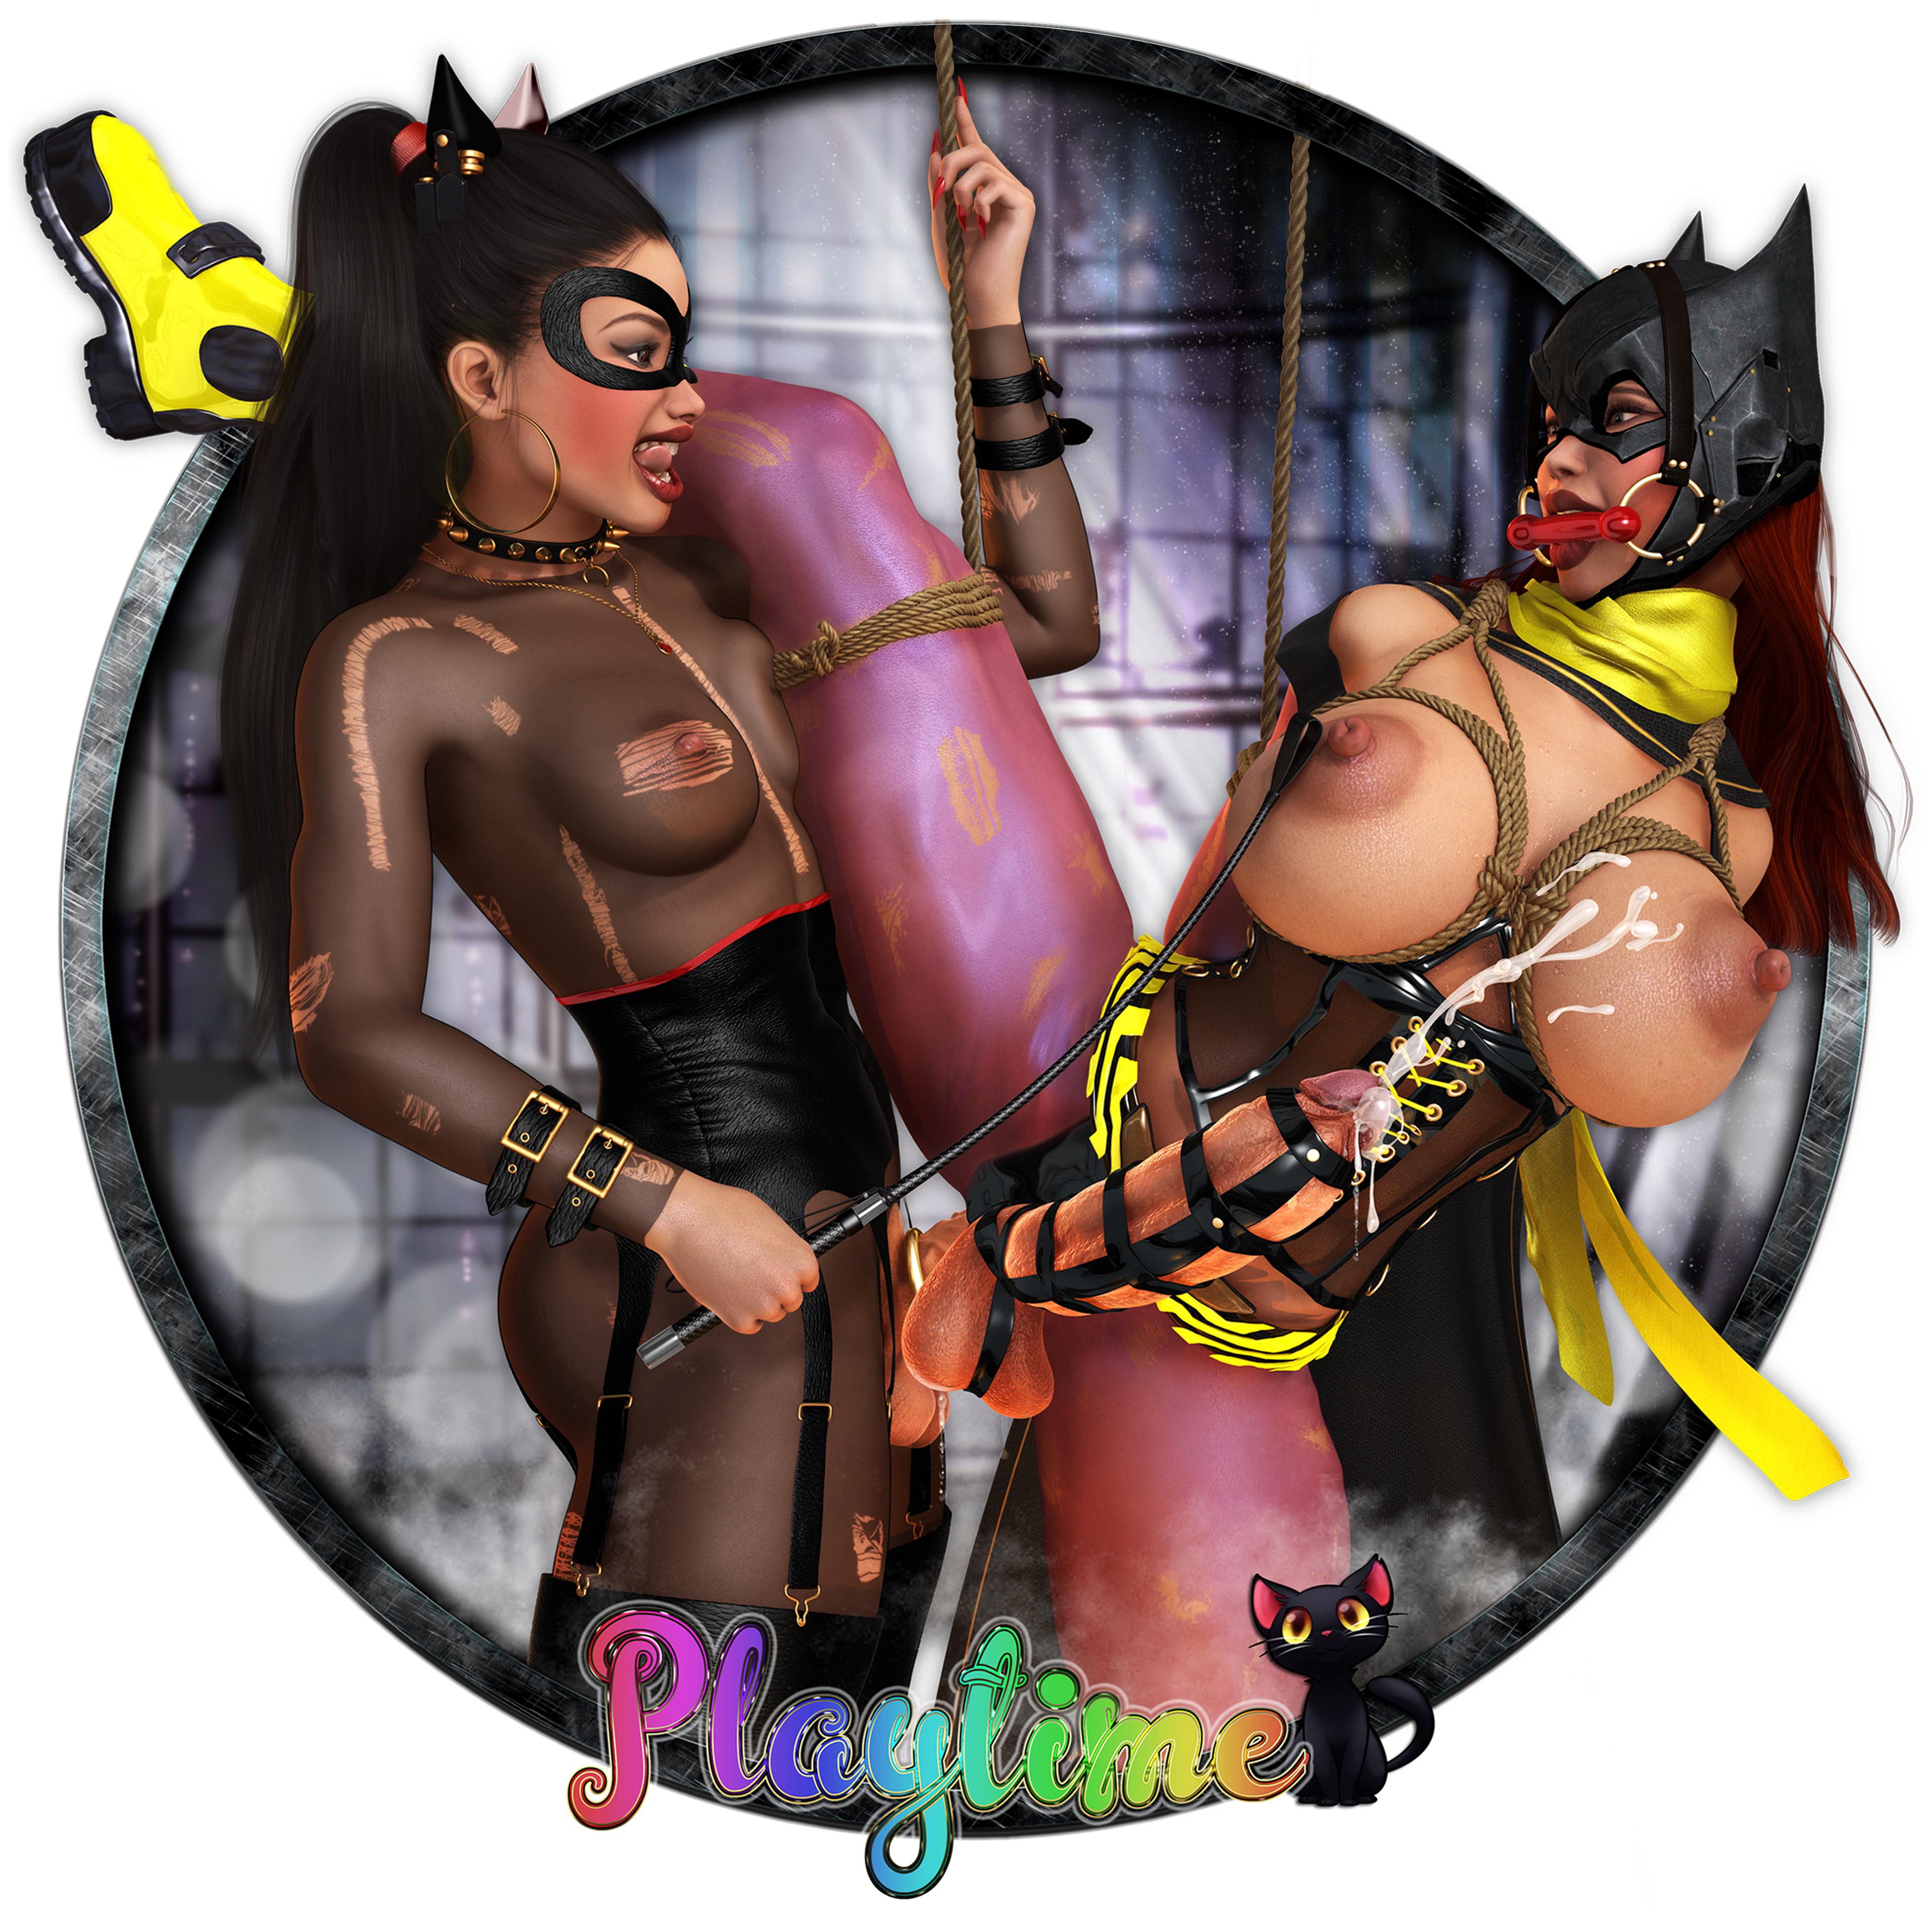 Playtime - Futa Version